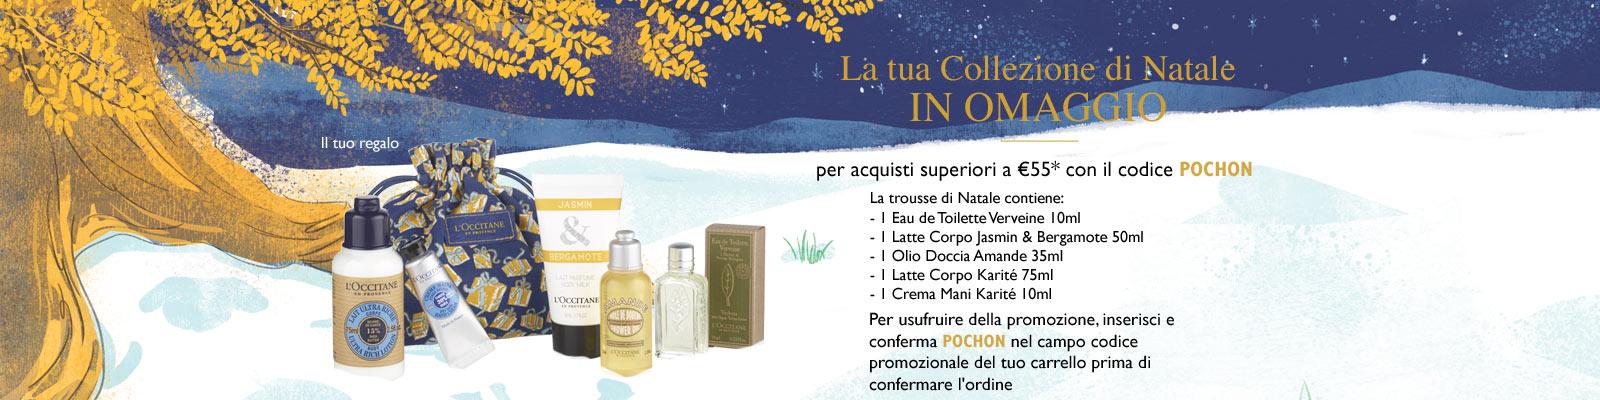 Oferta Natale- L'Occitane en Provence